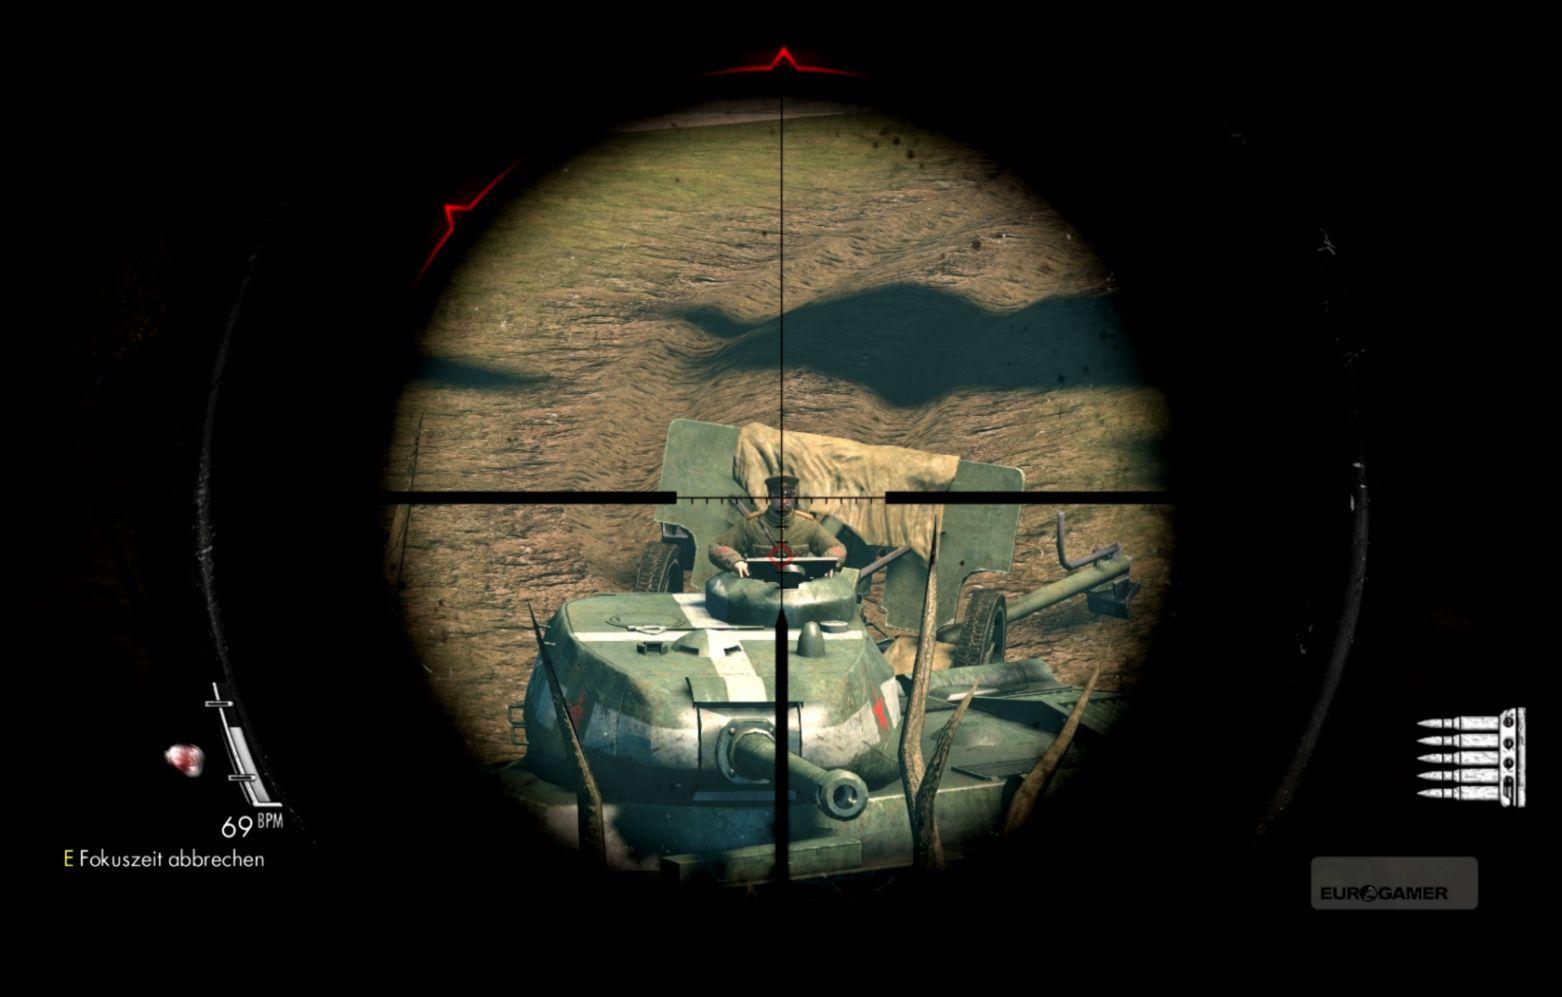 Sniper elite v2 hd wallpaper game pc wallpaper gallery view original size voltagebd Images